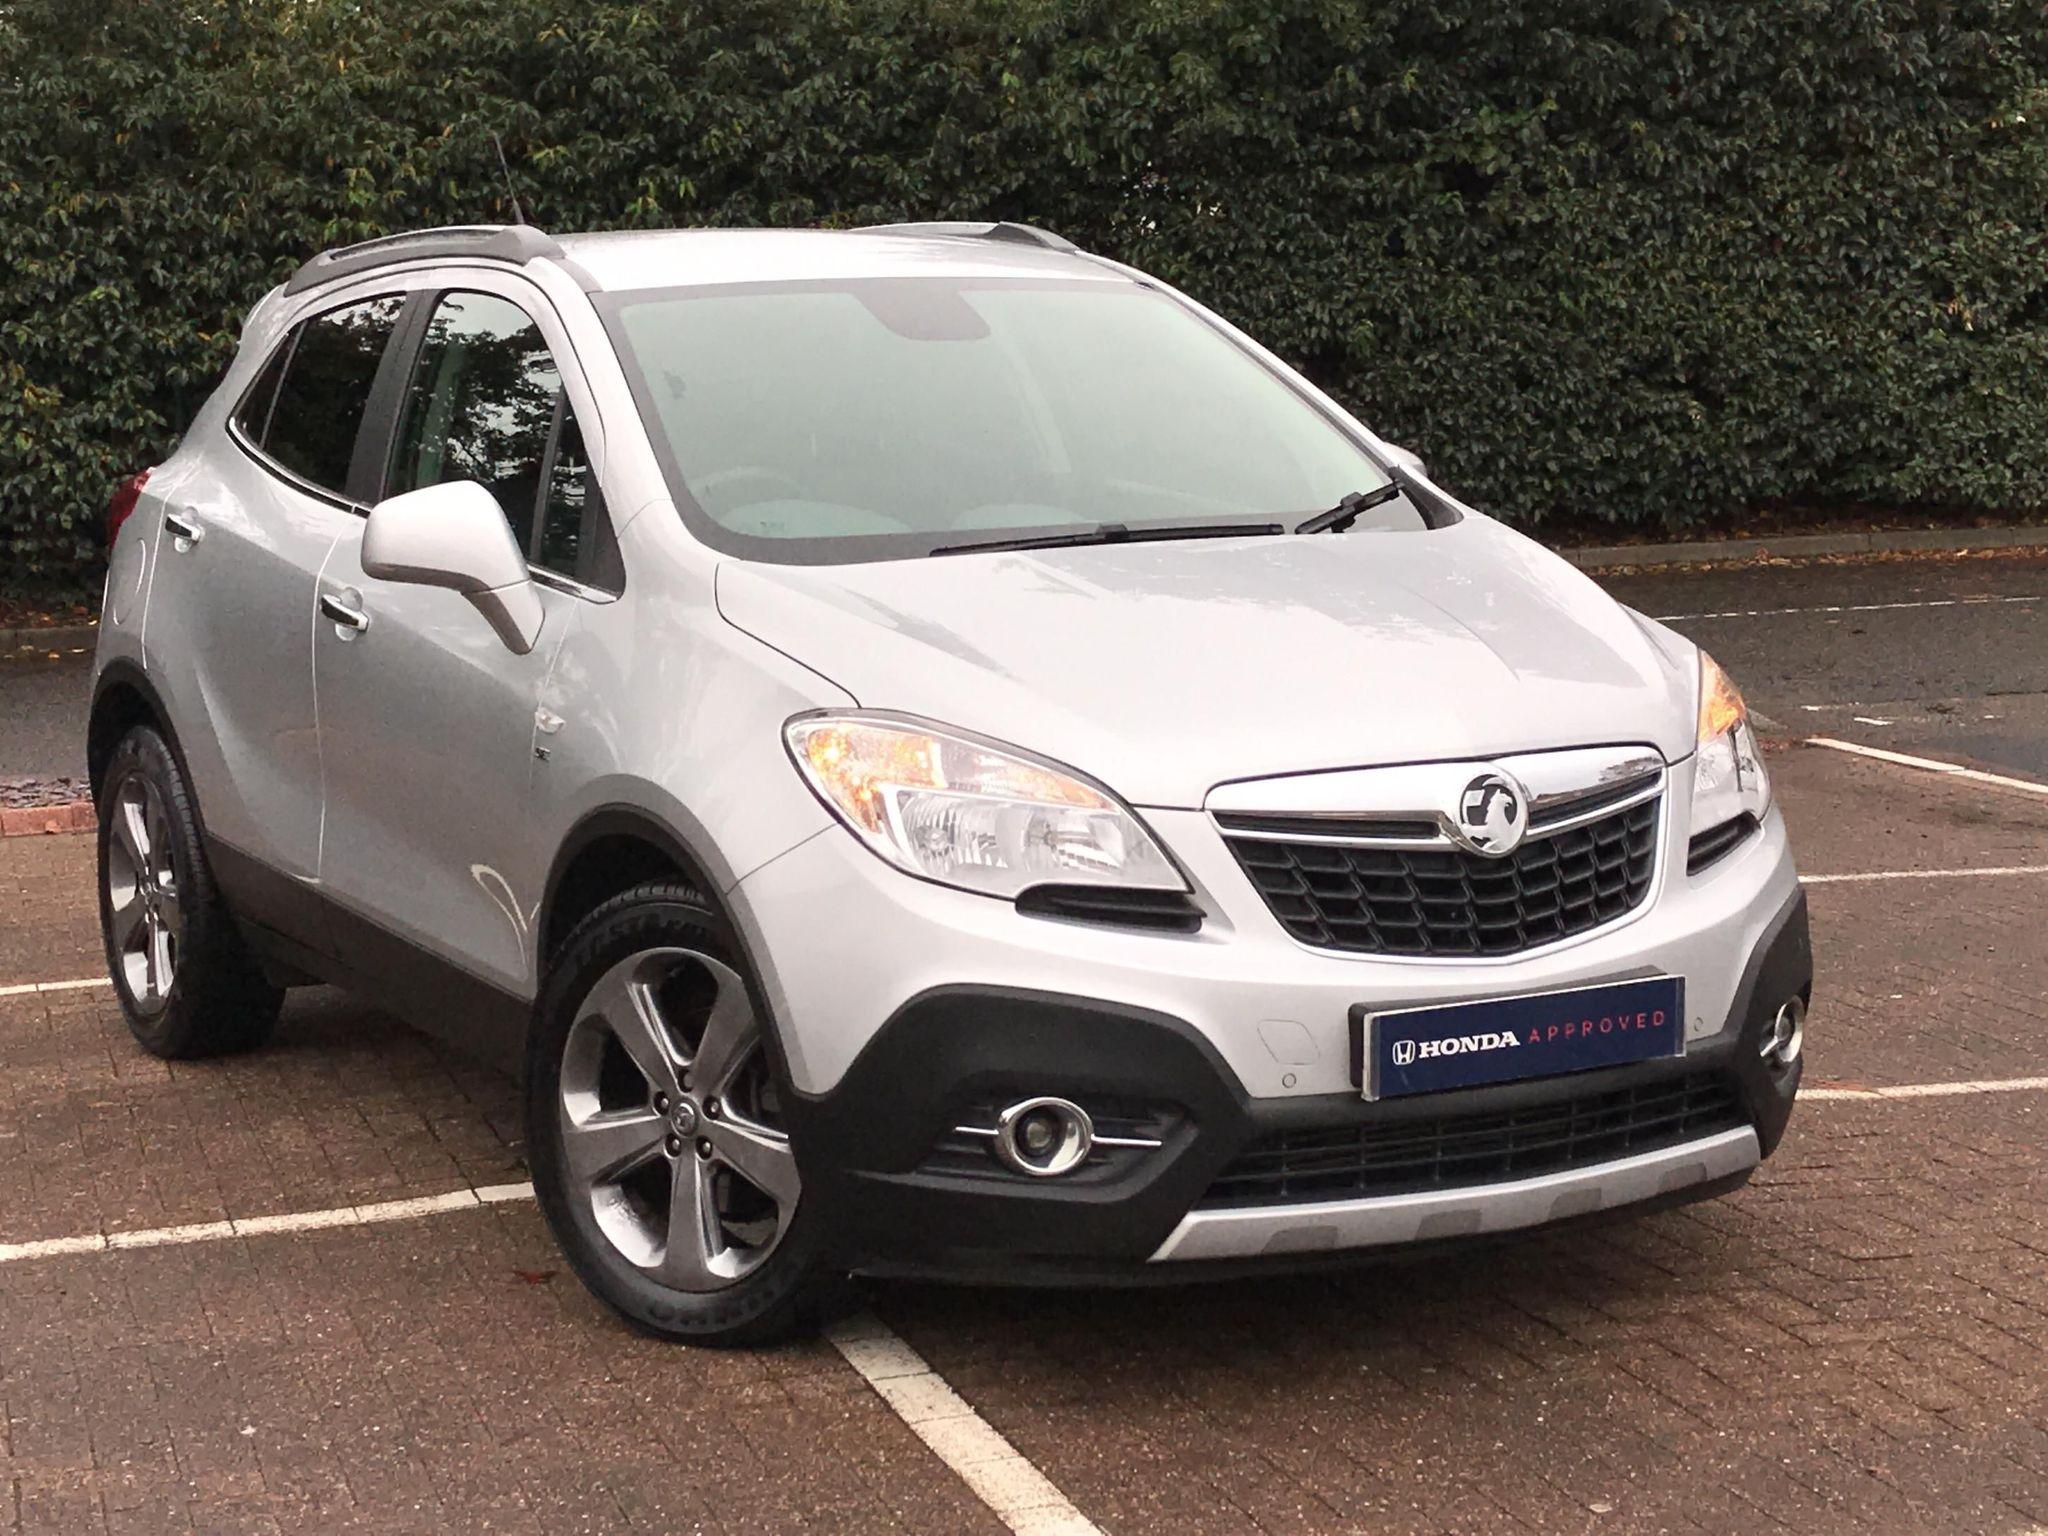 Vauxhall Mokka 1.7 CDTi 16v SE FWD 5dr